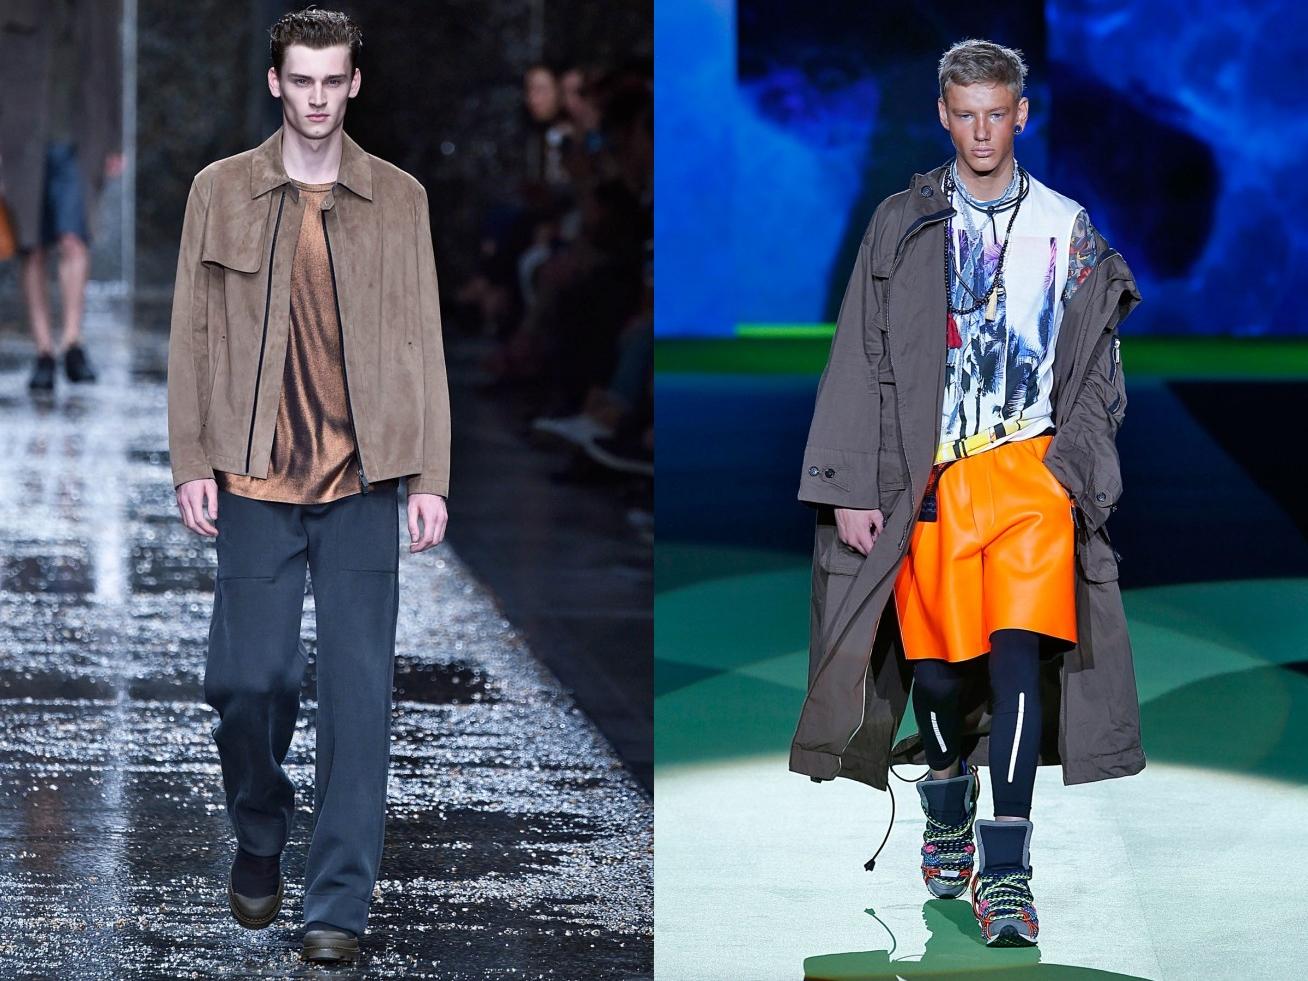 tendencia masculina, moda masculina, menswear, fashion blogger, blogueiro de moda, milan fashion week, trends, verão 2016, summer 2016, alex cursino, moda sem censura, 2